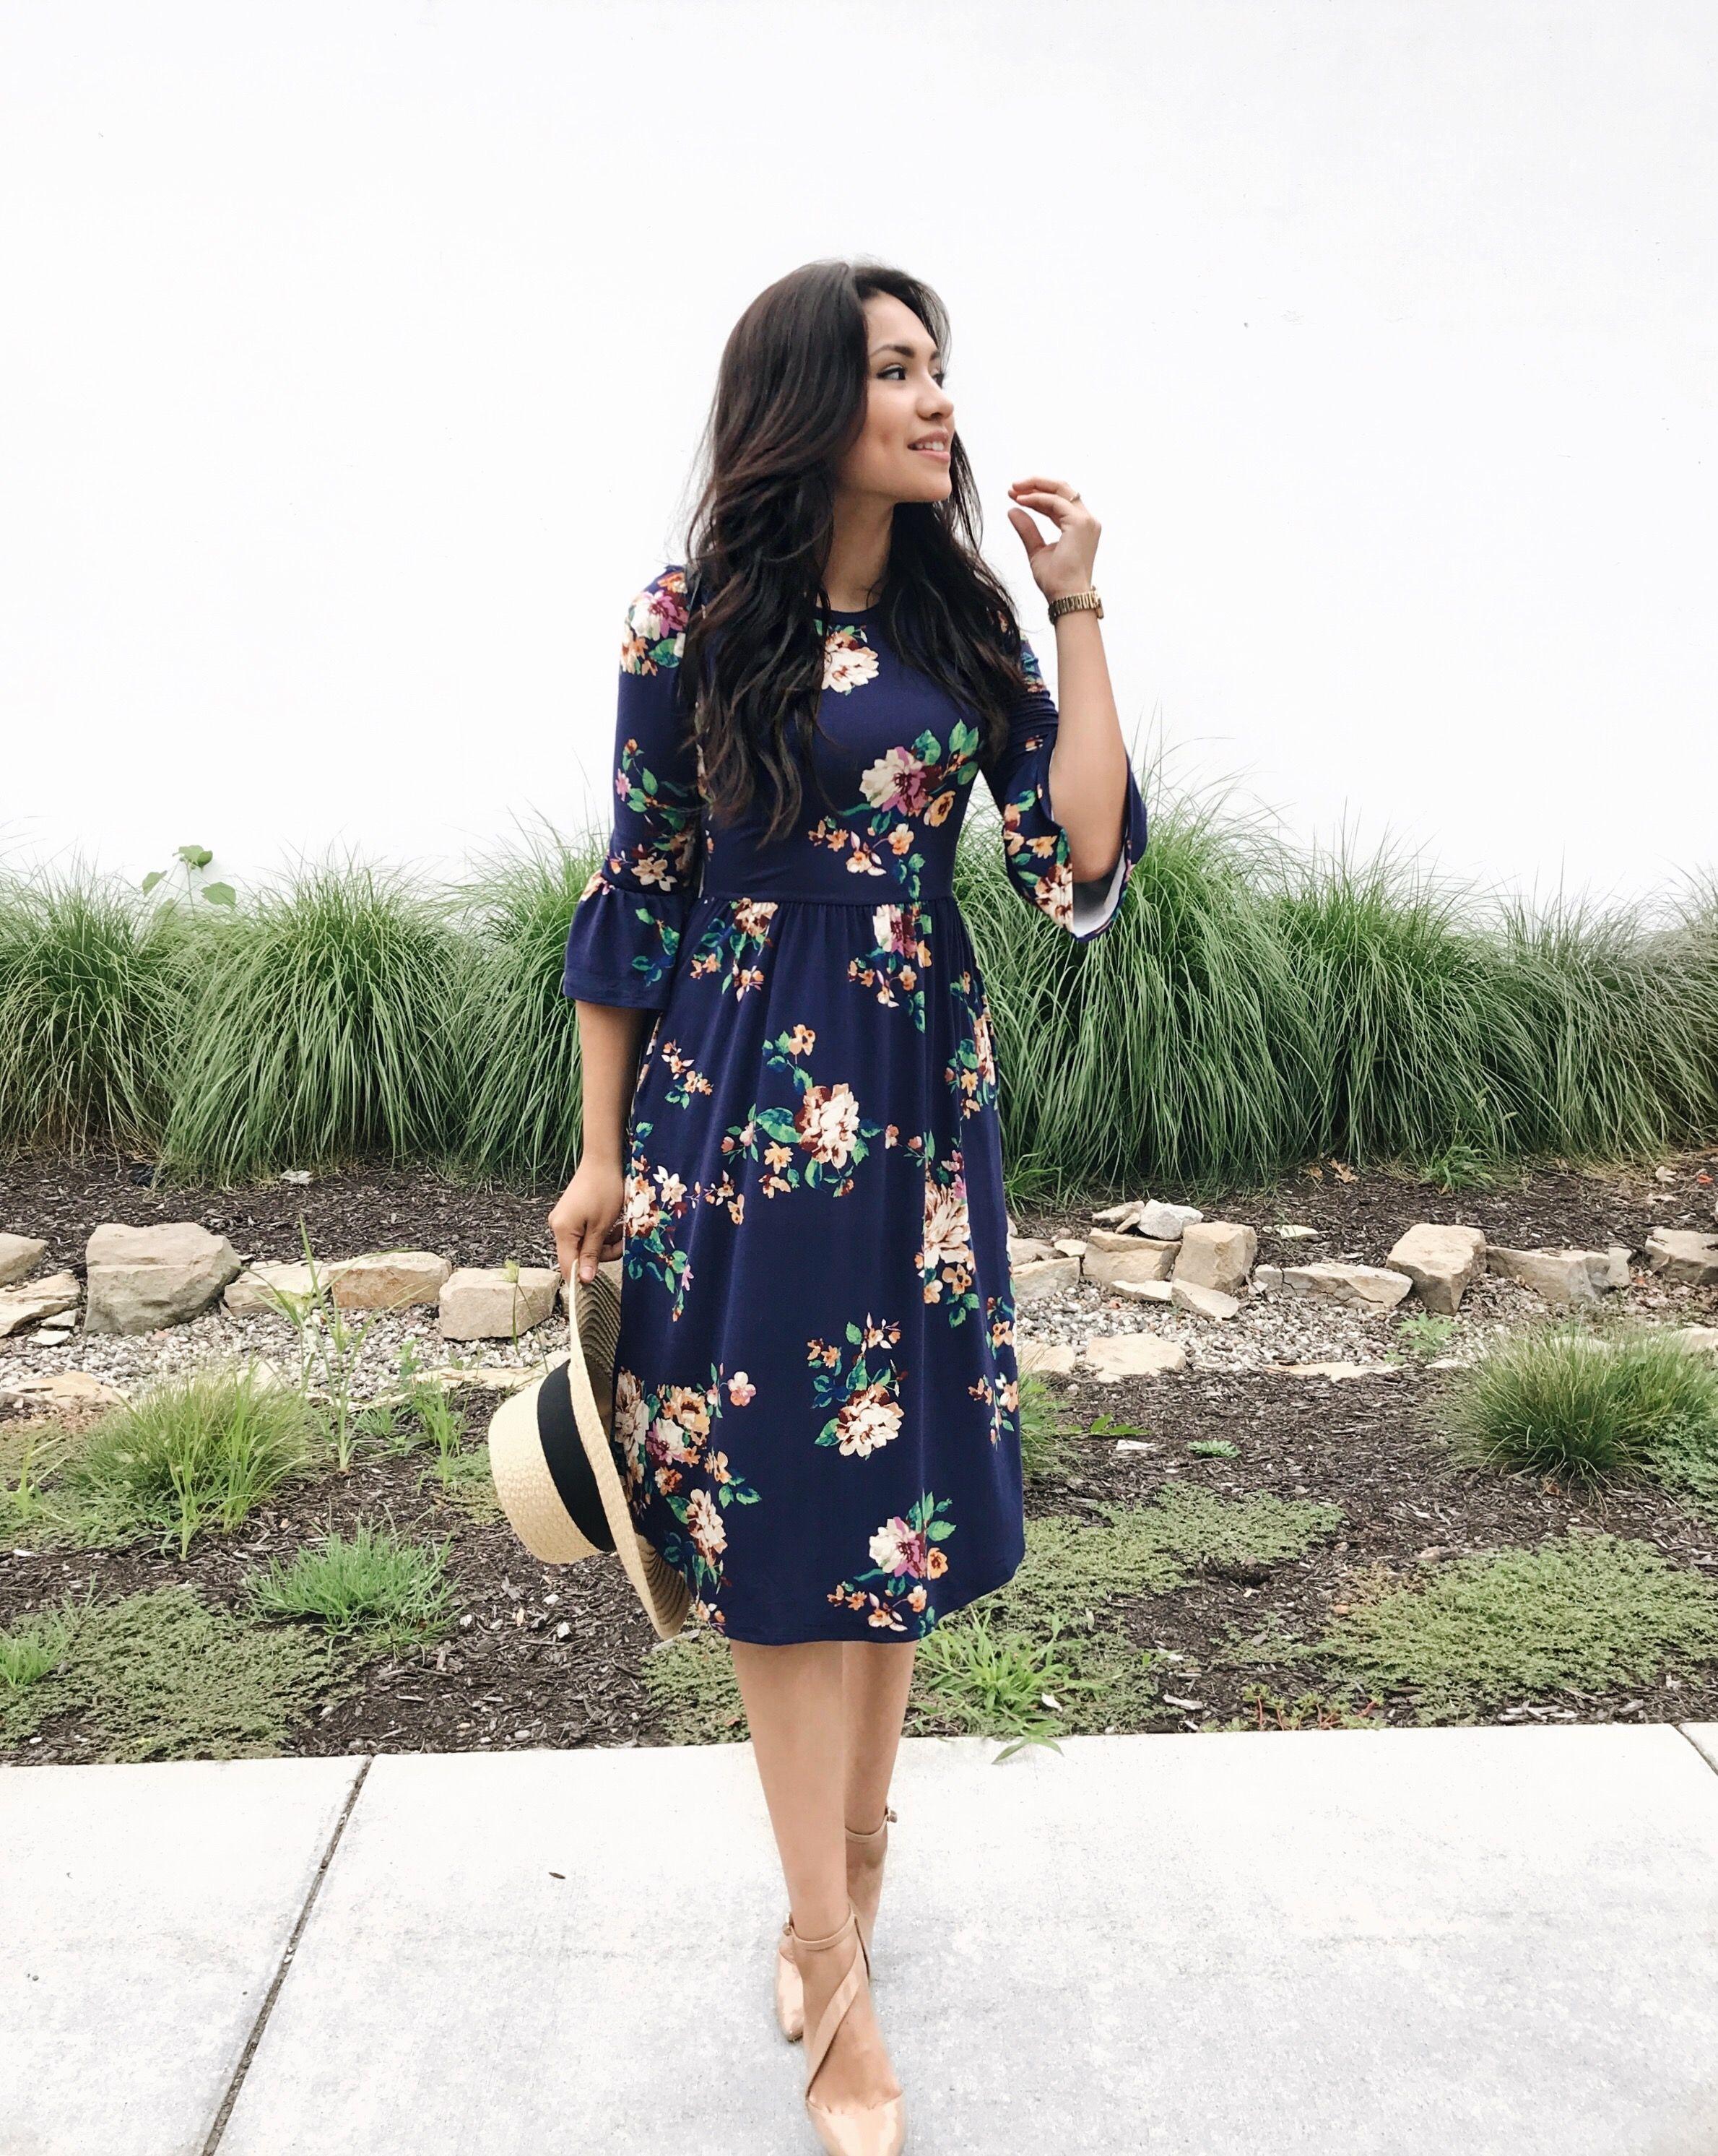 f6bb2cbb78c9 Modest Dresses, Fall Dresses. Moda Modesta, apostolic fashion, Pentecostal  Fashion. Women's Clothing.